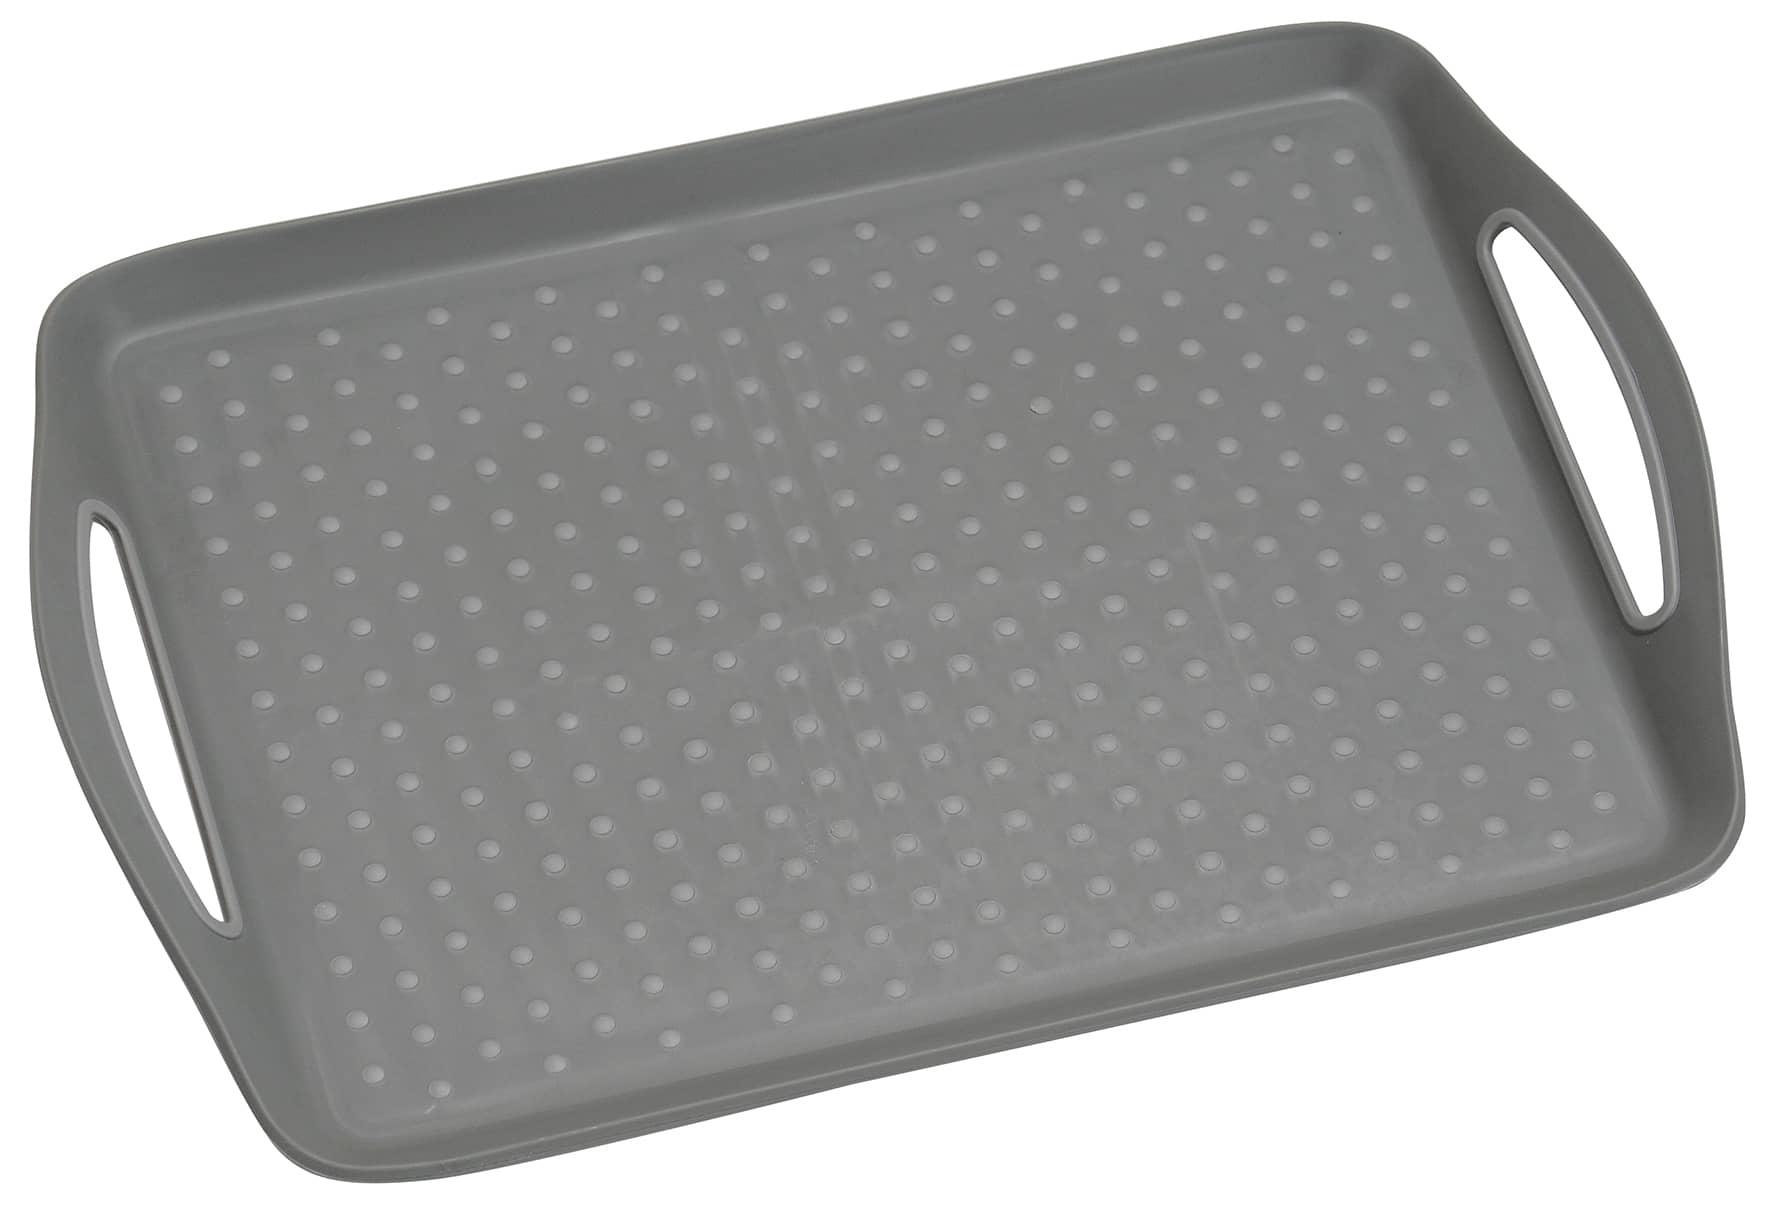 Anti-slip dienblad 45,5x32x4,5 cm - Dienblad Rechthoek - Grijs